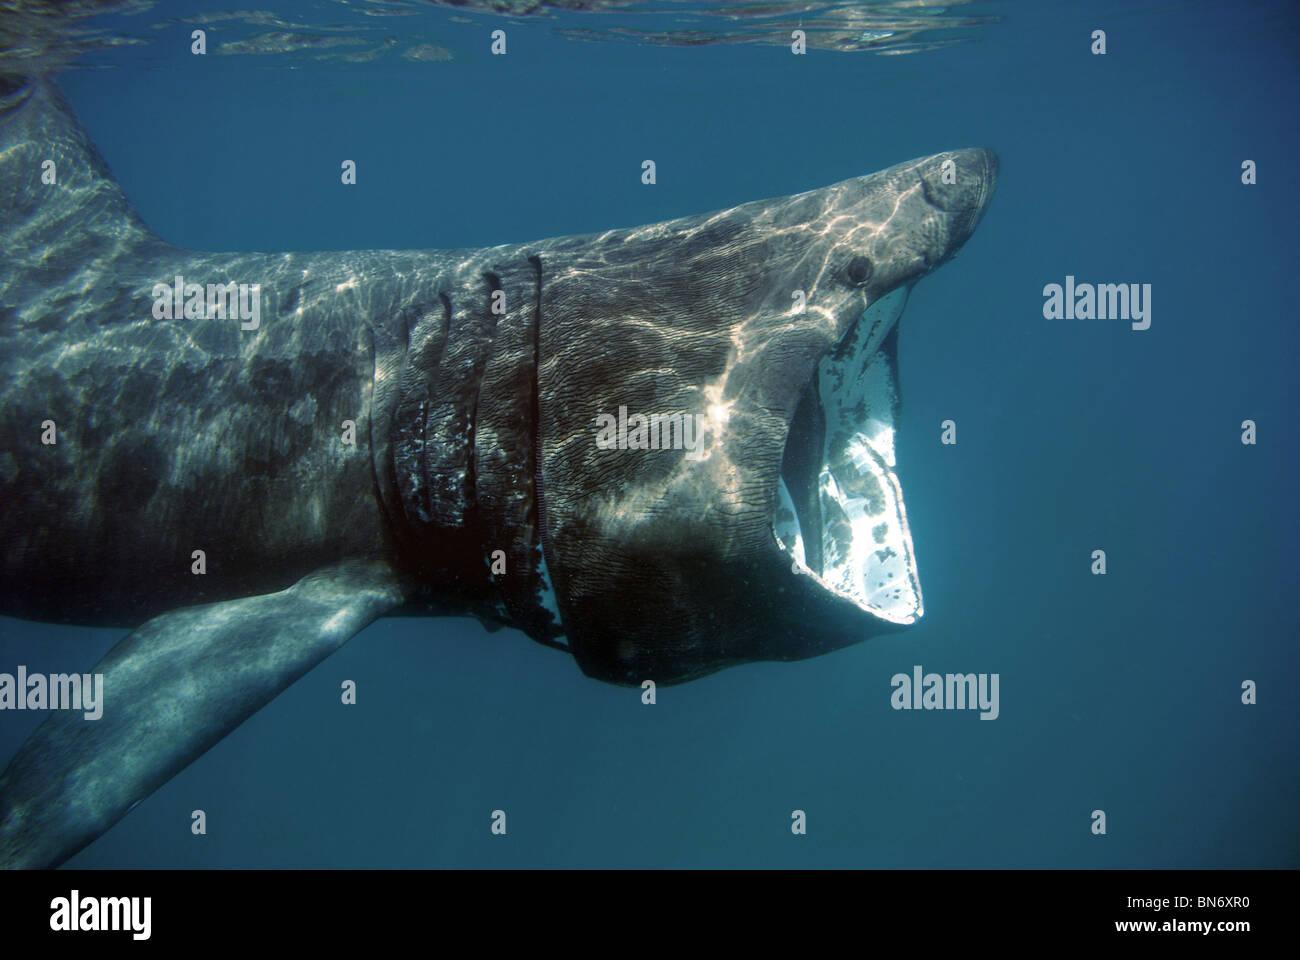 Basking shark in UK waters - Stock Image